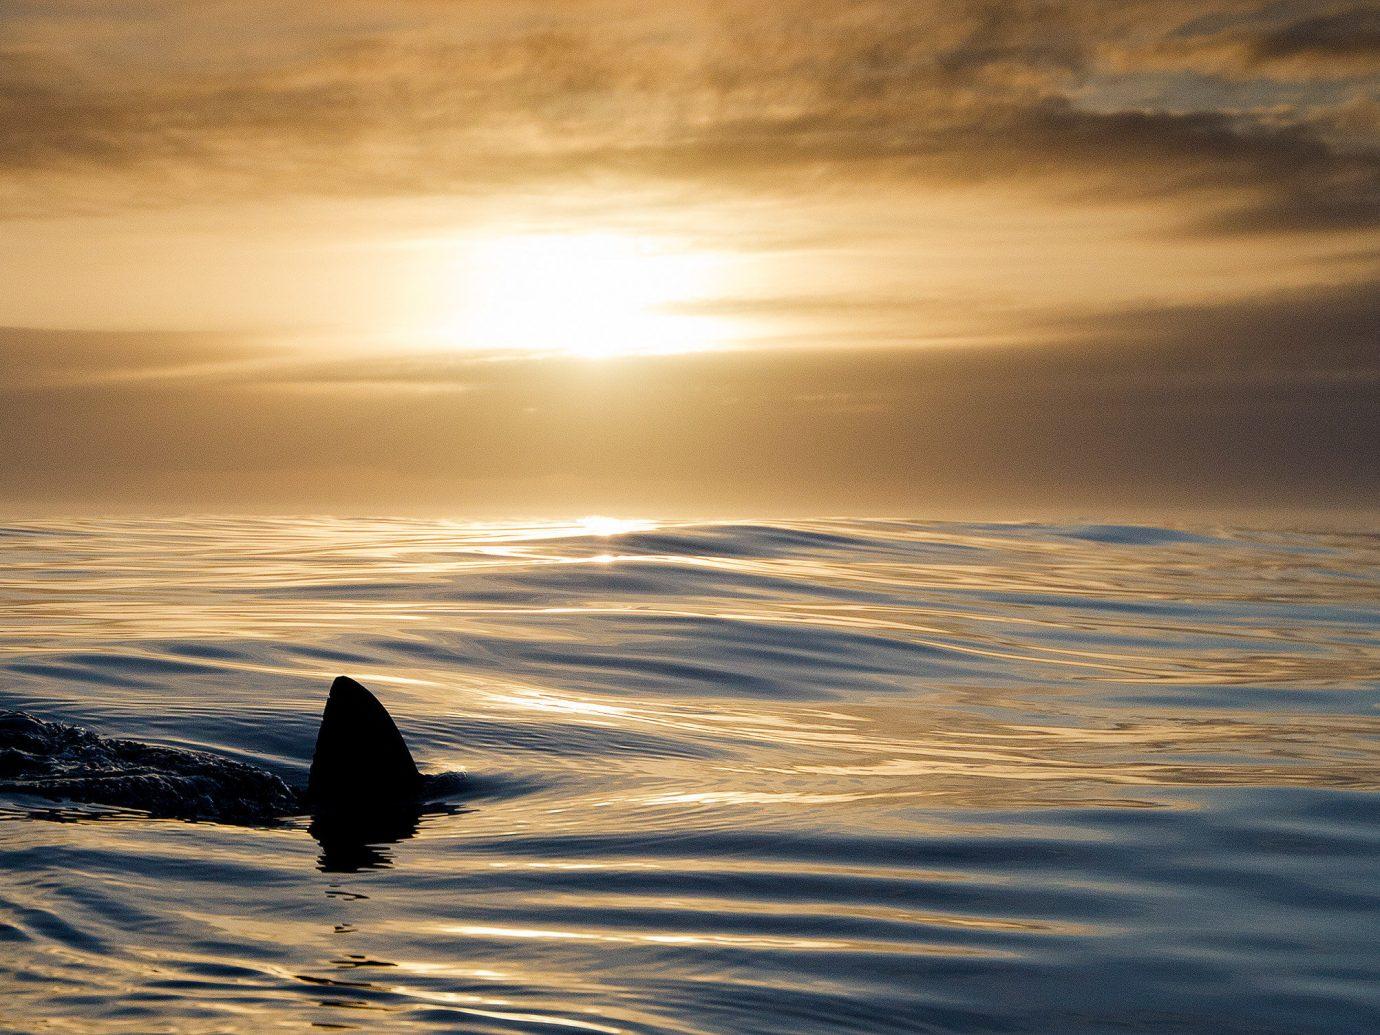 Trip Ideas outdoor water Sea Ocean sky Sunset horizon wave wind wave calm marine mammal shore atmosphere Sun sunlight sunrise cloud whales dolphins and porpoises dolphin evening dawn